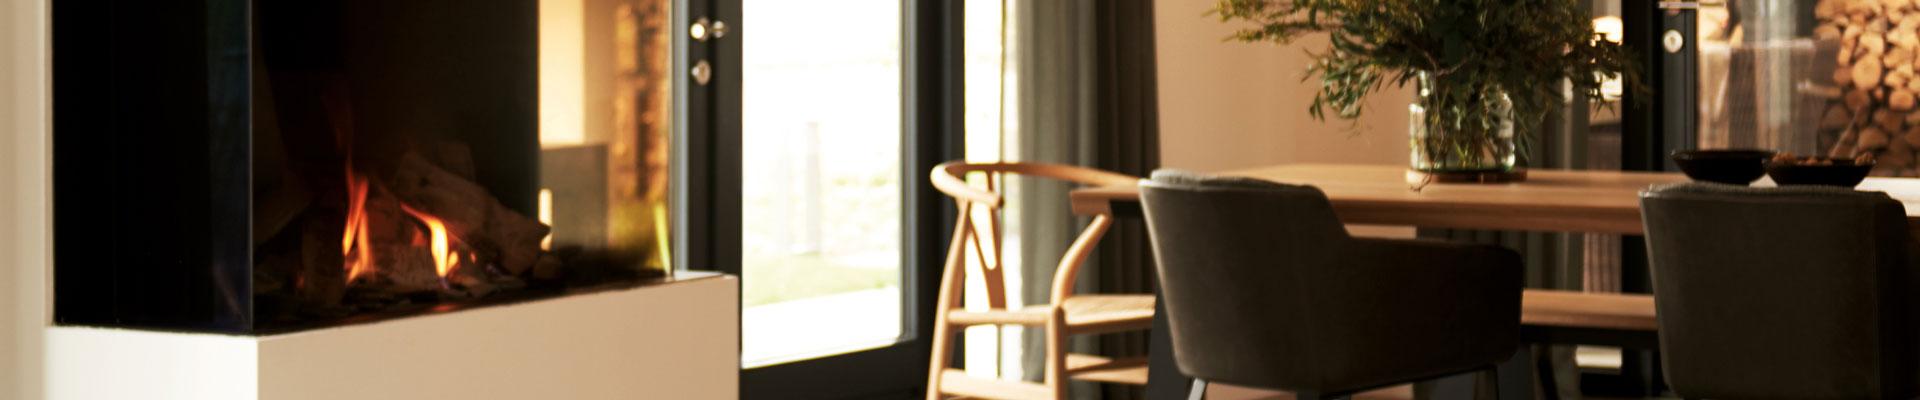 Binnenkijker: modern familiehuis in Oegstgeest